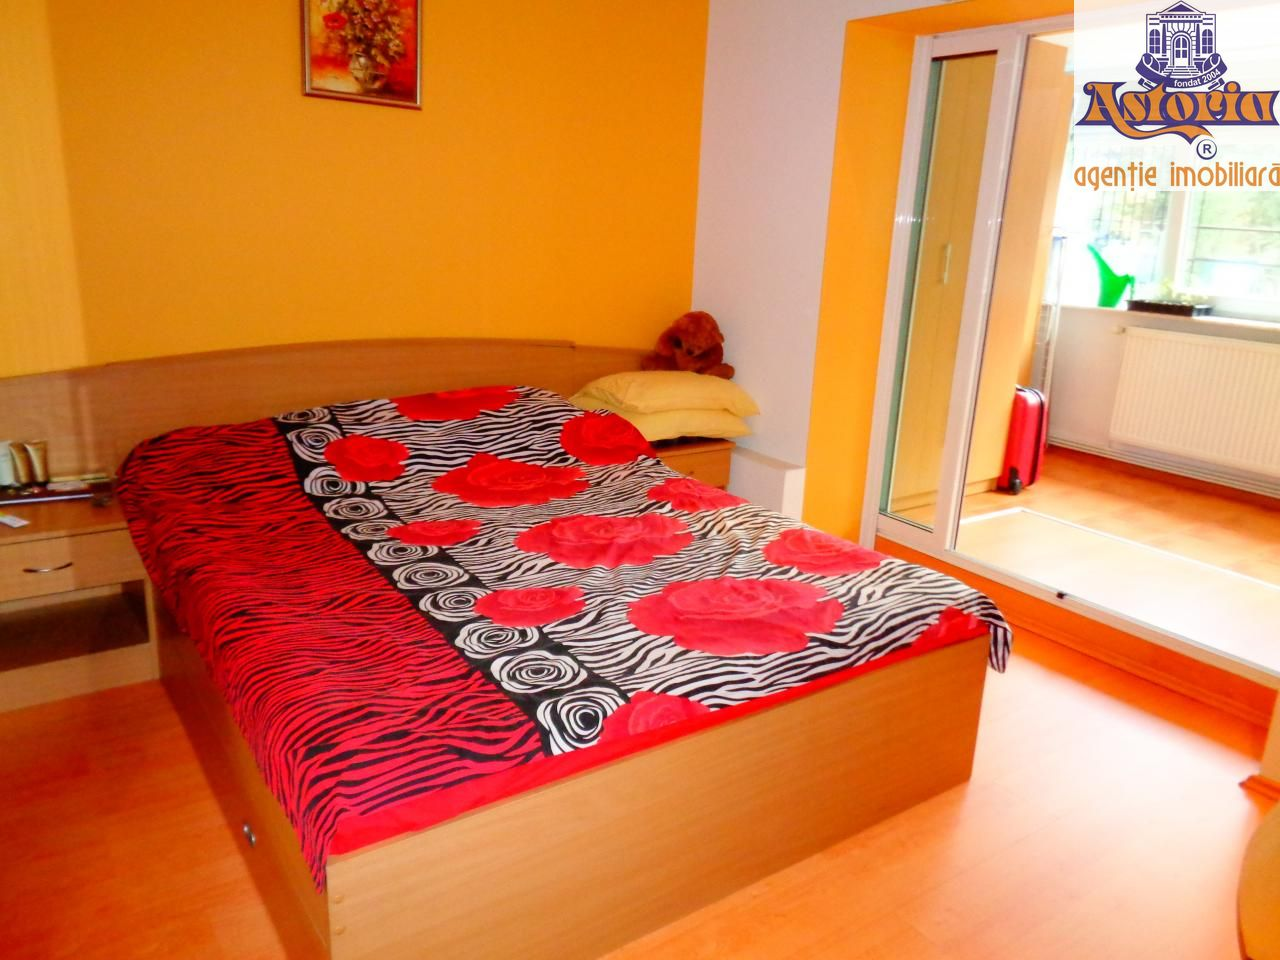 Apartament de vanzare, Pitesti, Arges, Banat - Foto 4